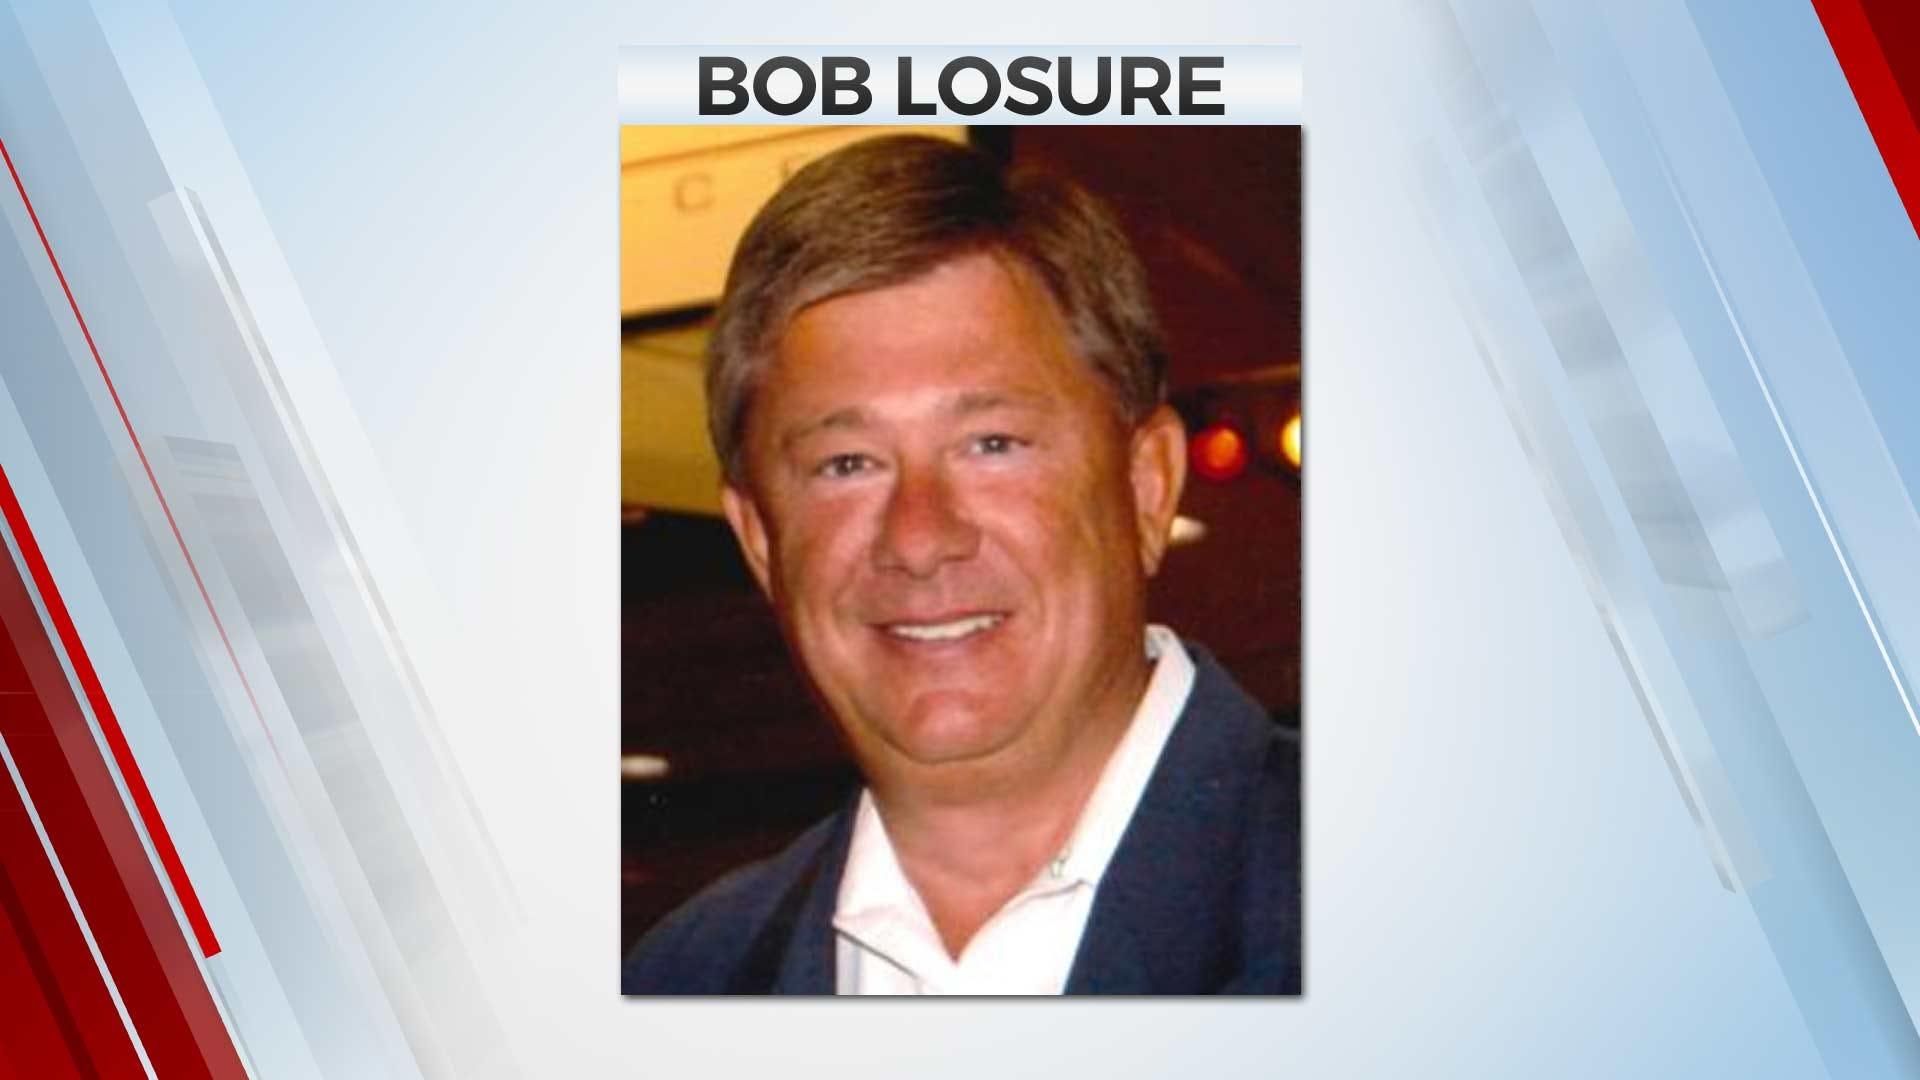 Former CNN, KOTV Anchor Bob Losure Dies